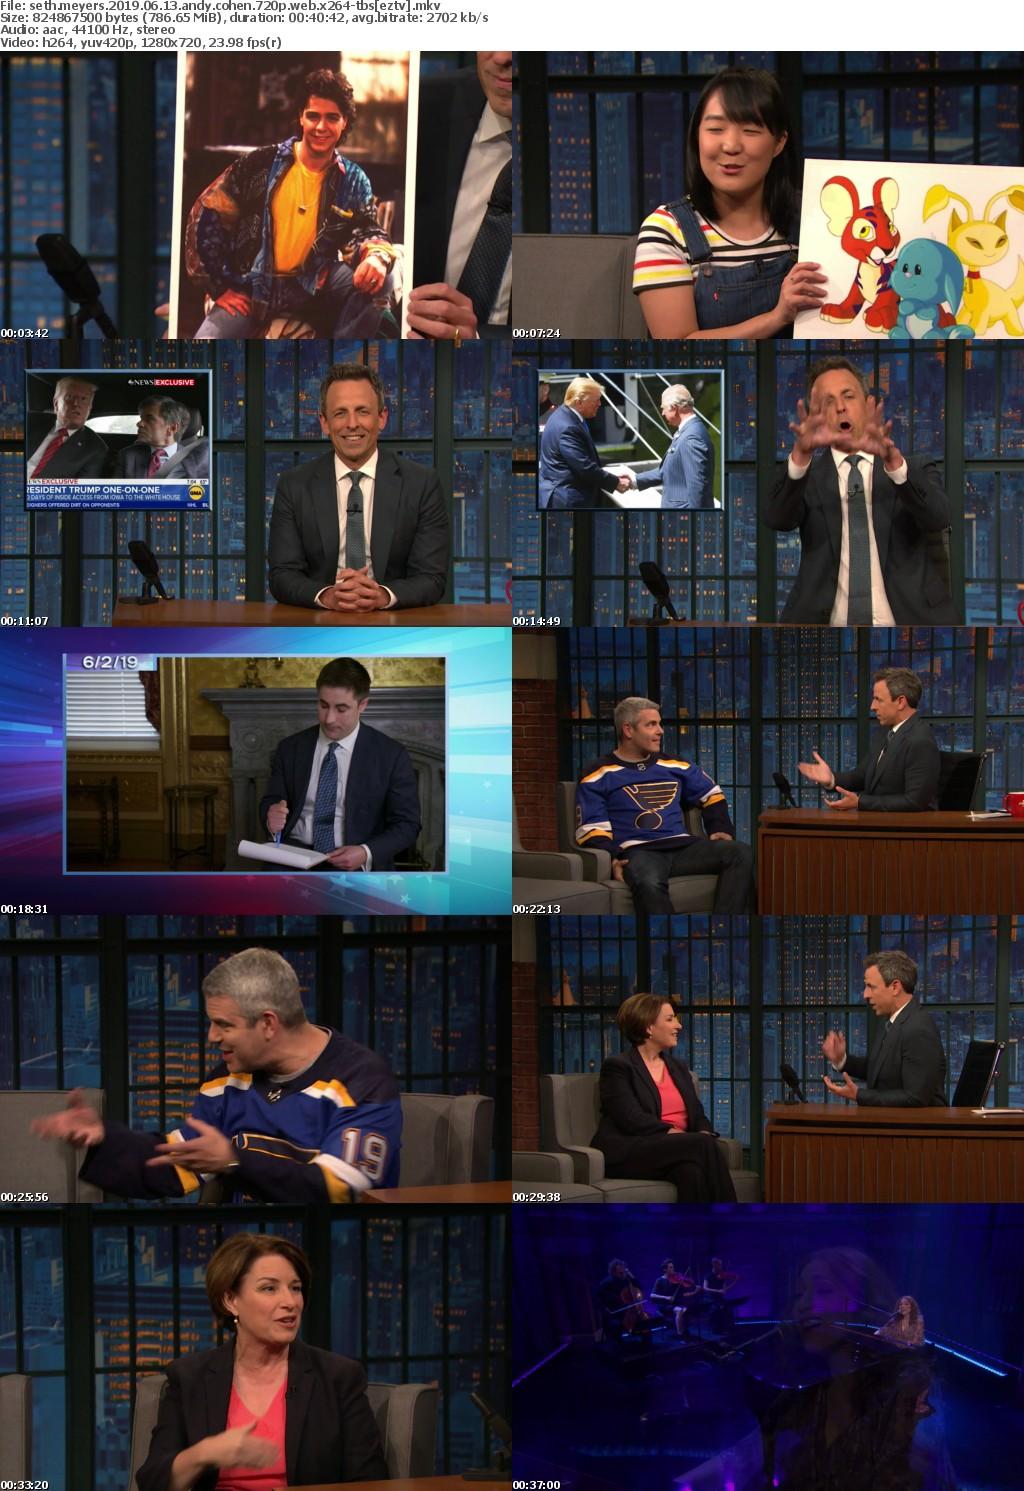 Seth Meyers 2019 06 13 Andy Cohen 720p WEB x264-TBS